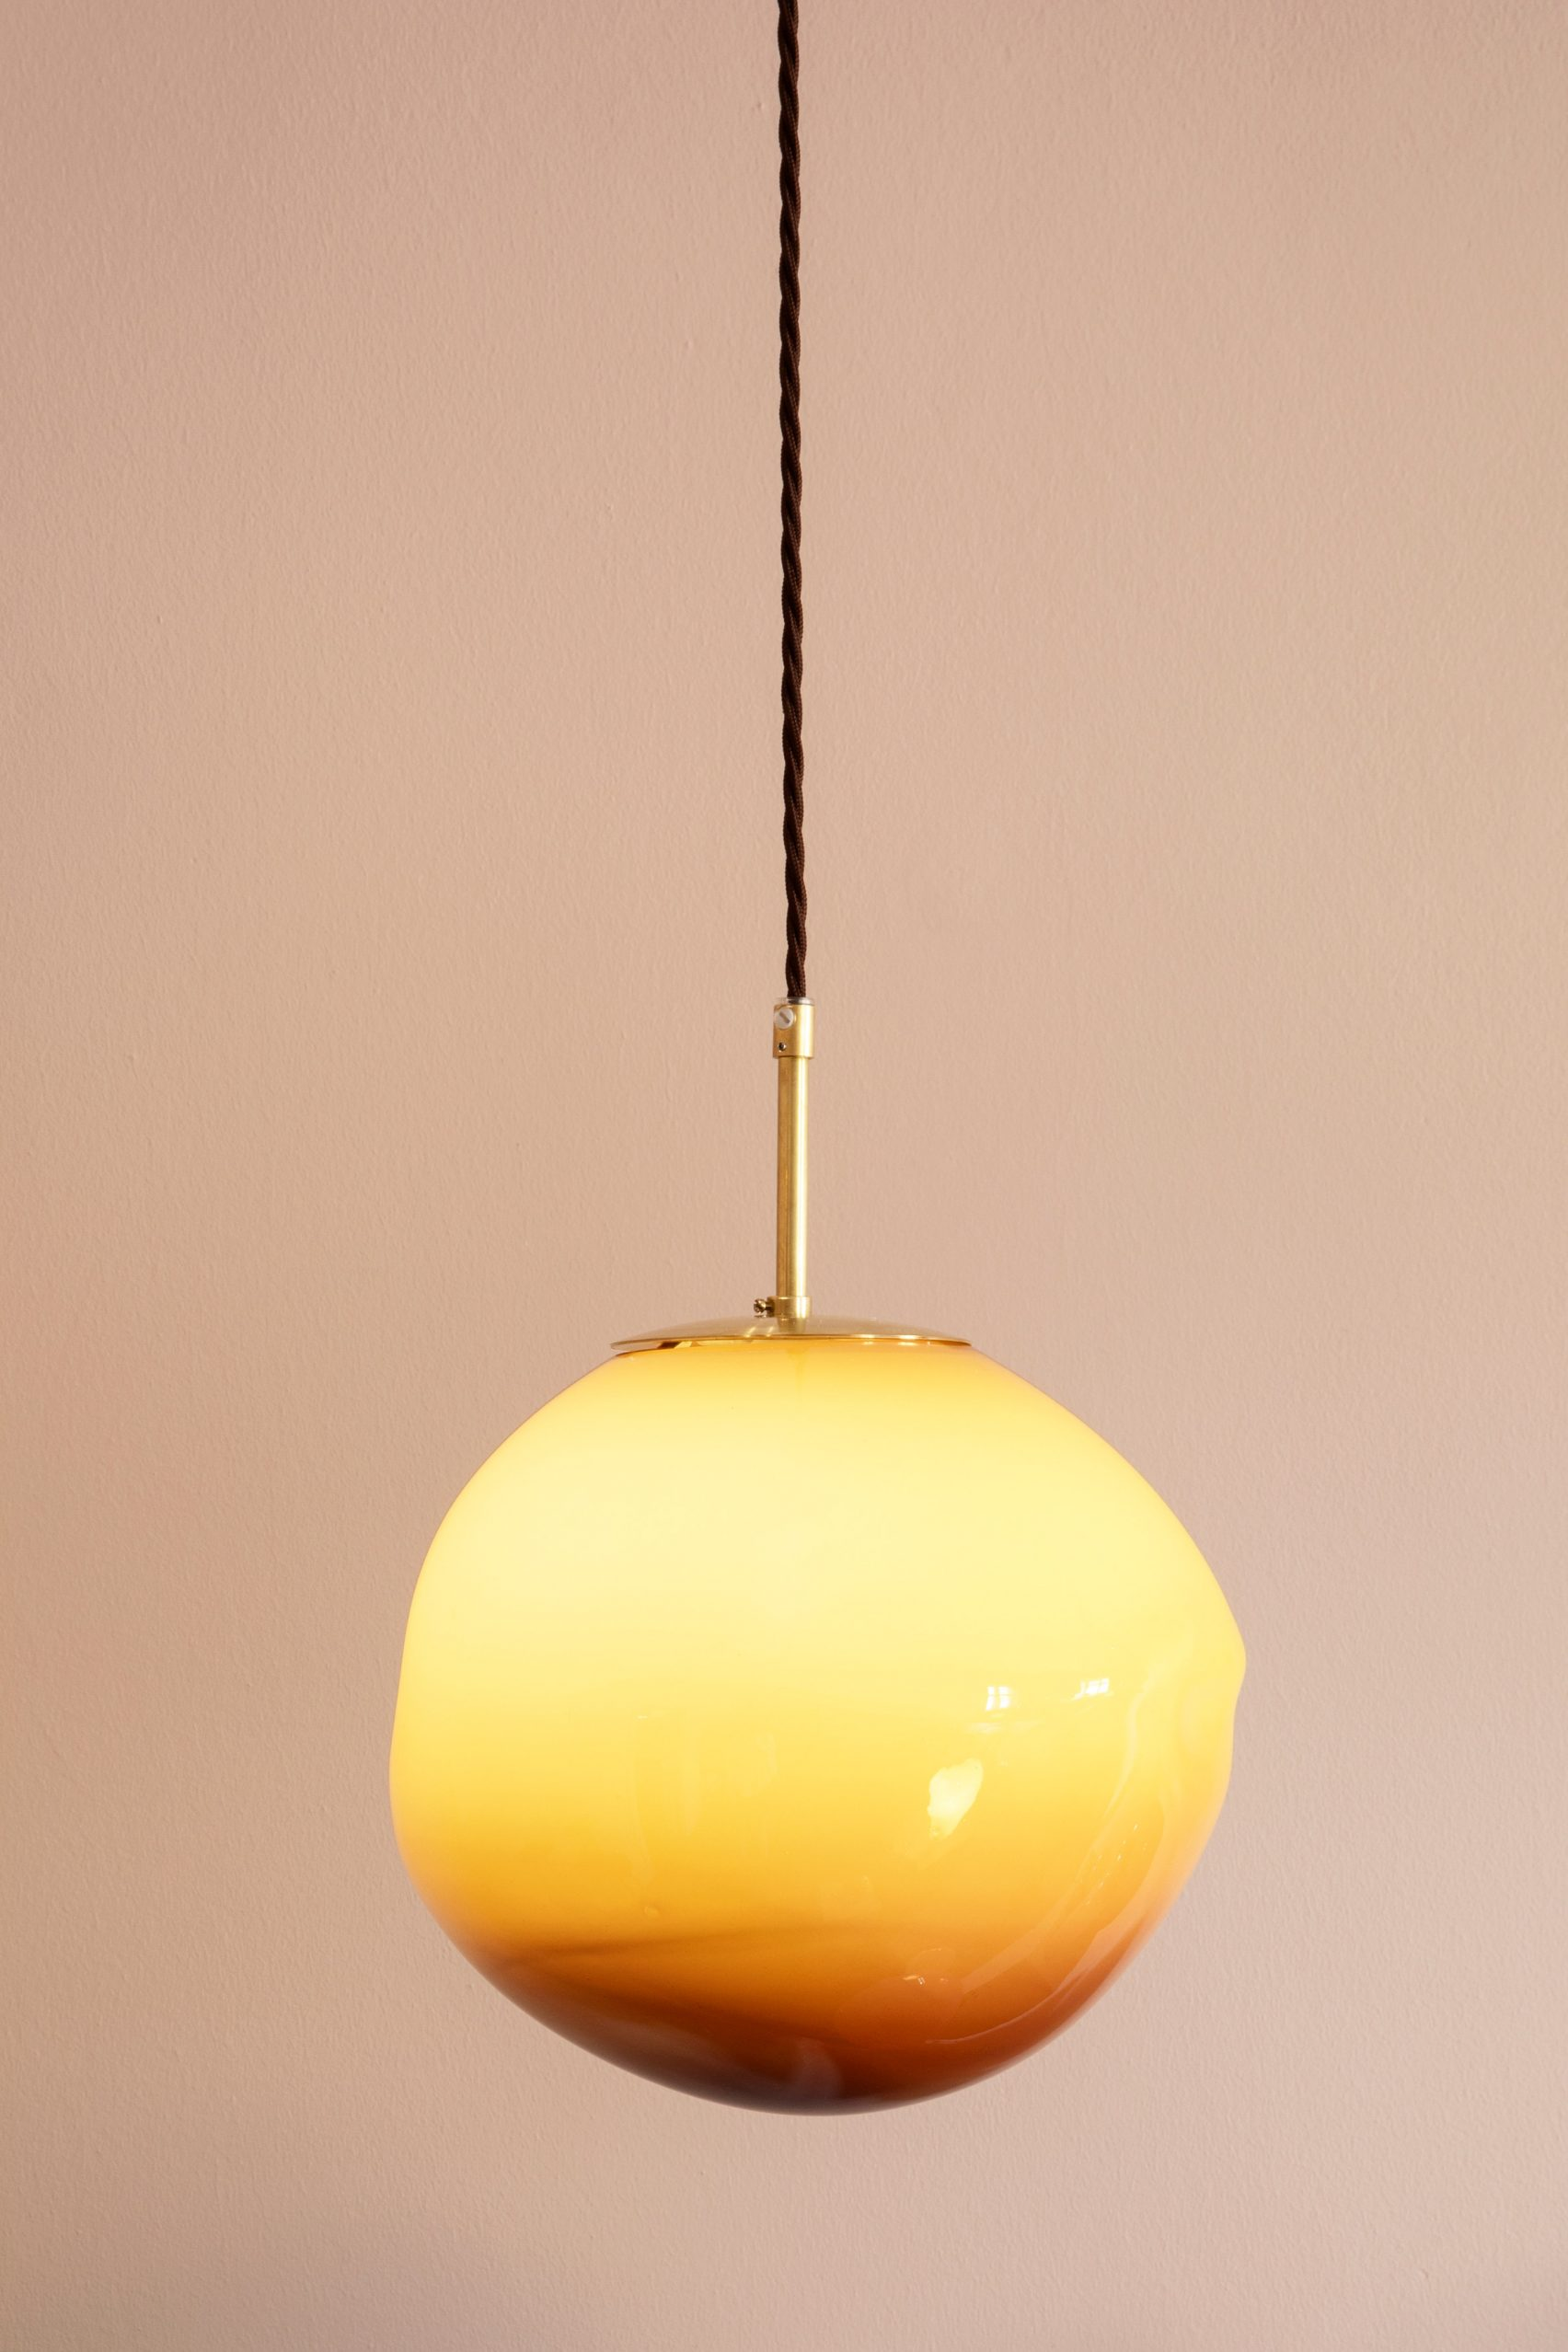 candy-light-collection-helle-mardahl-design_dezeen_2364_col_4-1704x2556.jpg